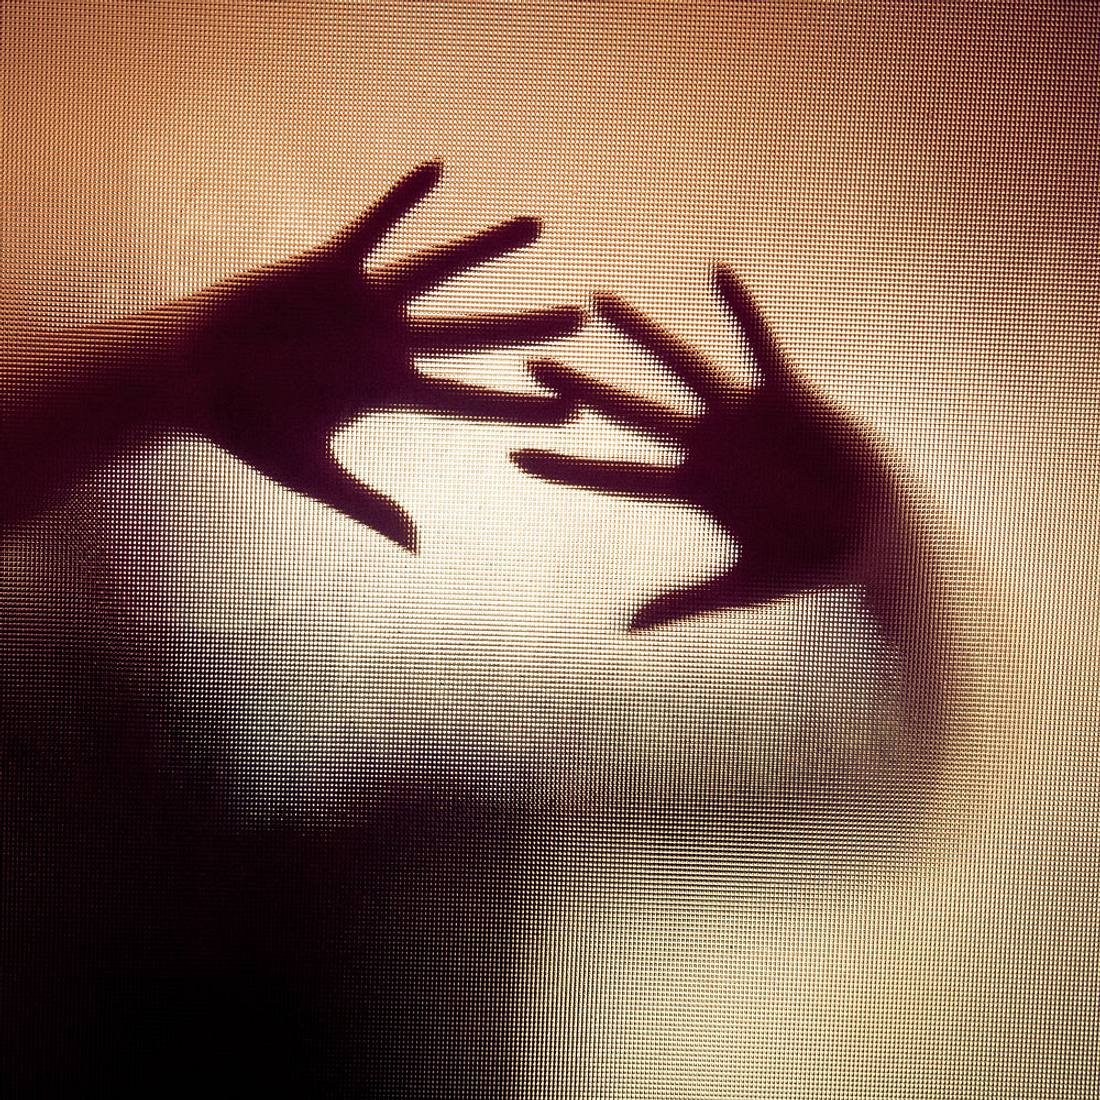 Mann (50) vergewaltigt demenzkranke Frau im Pflegeheim